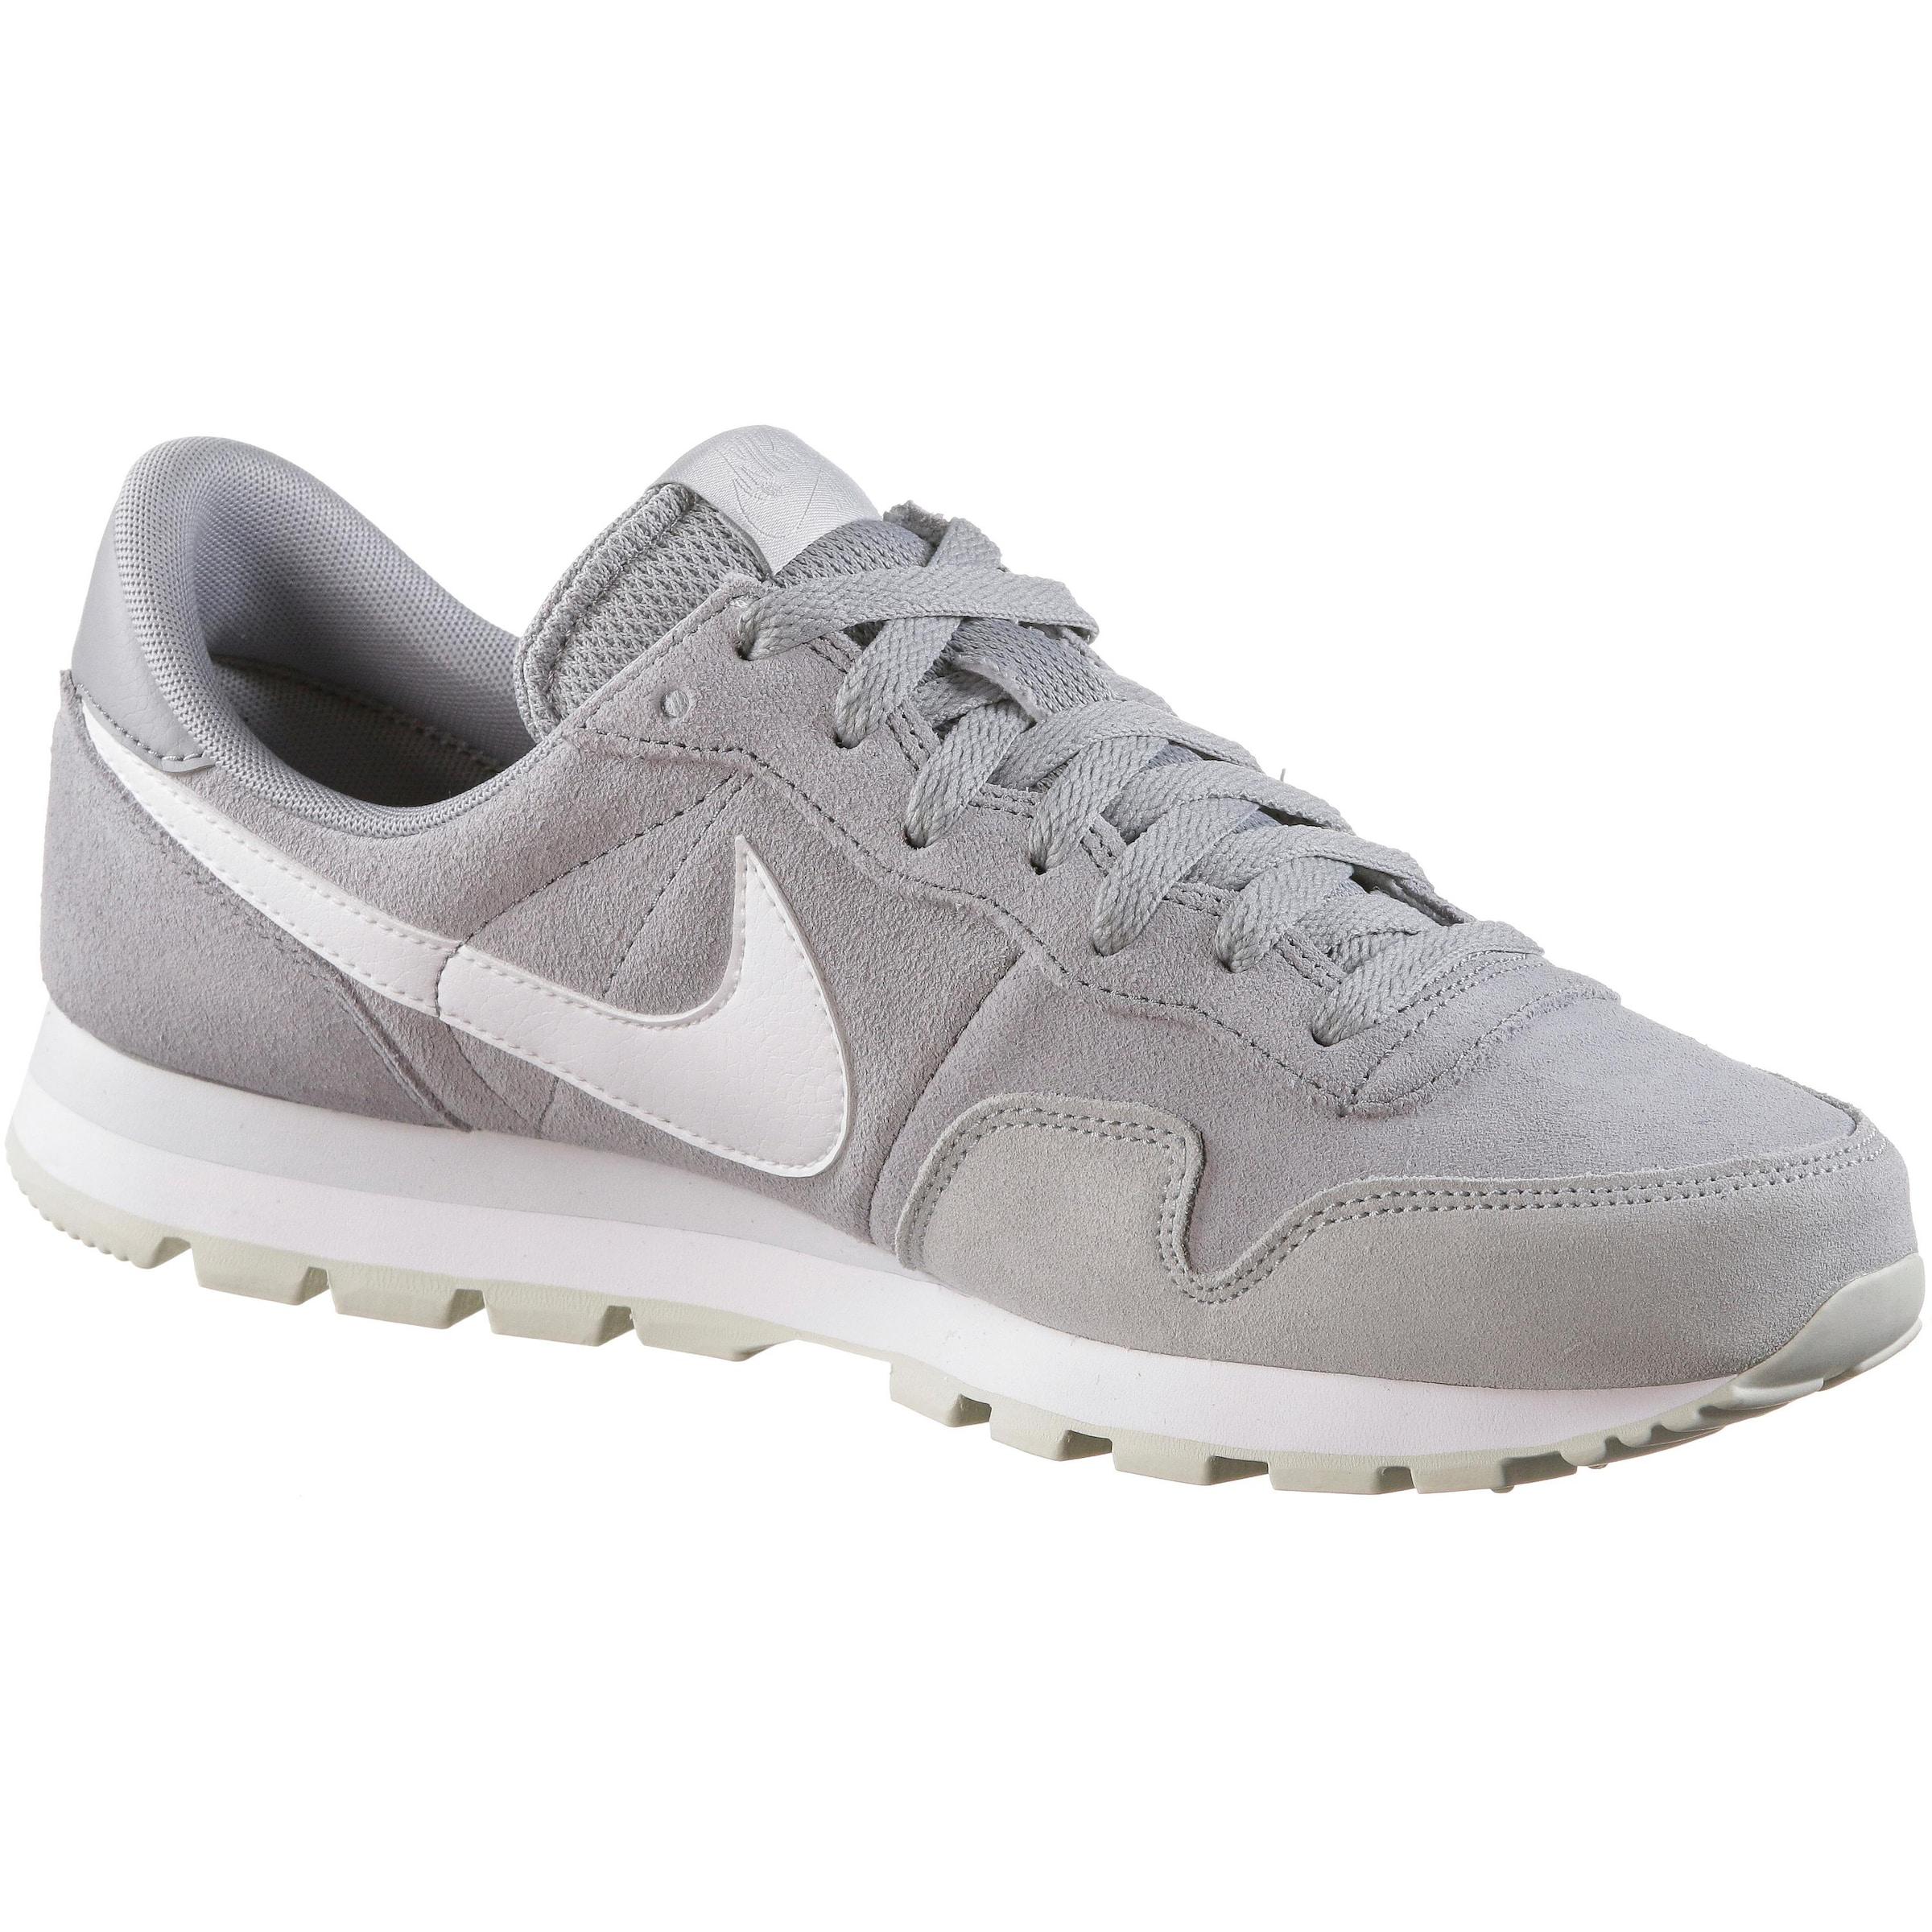 Sportswear HellgrauWeiß Pegasus 'air 83' Nike In Sneaker TZkiPXOu